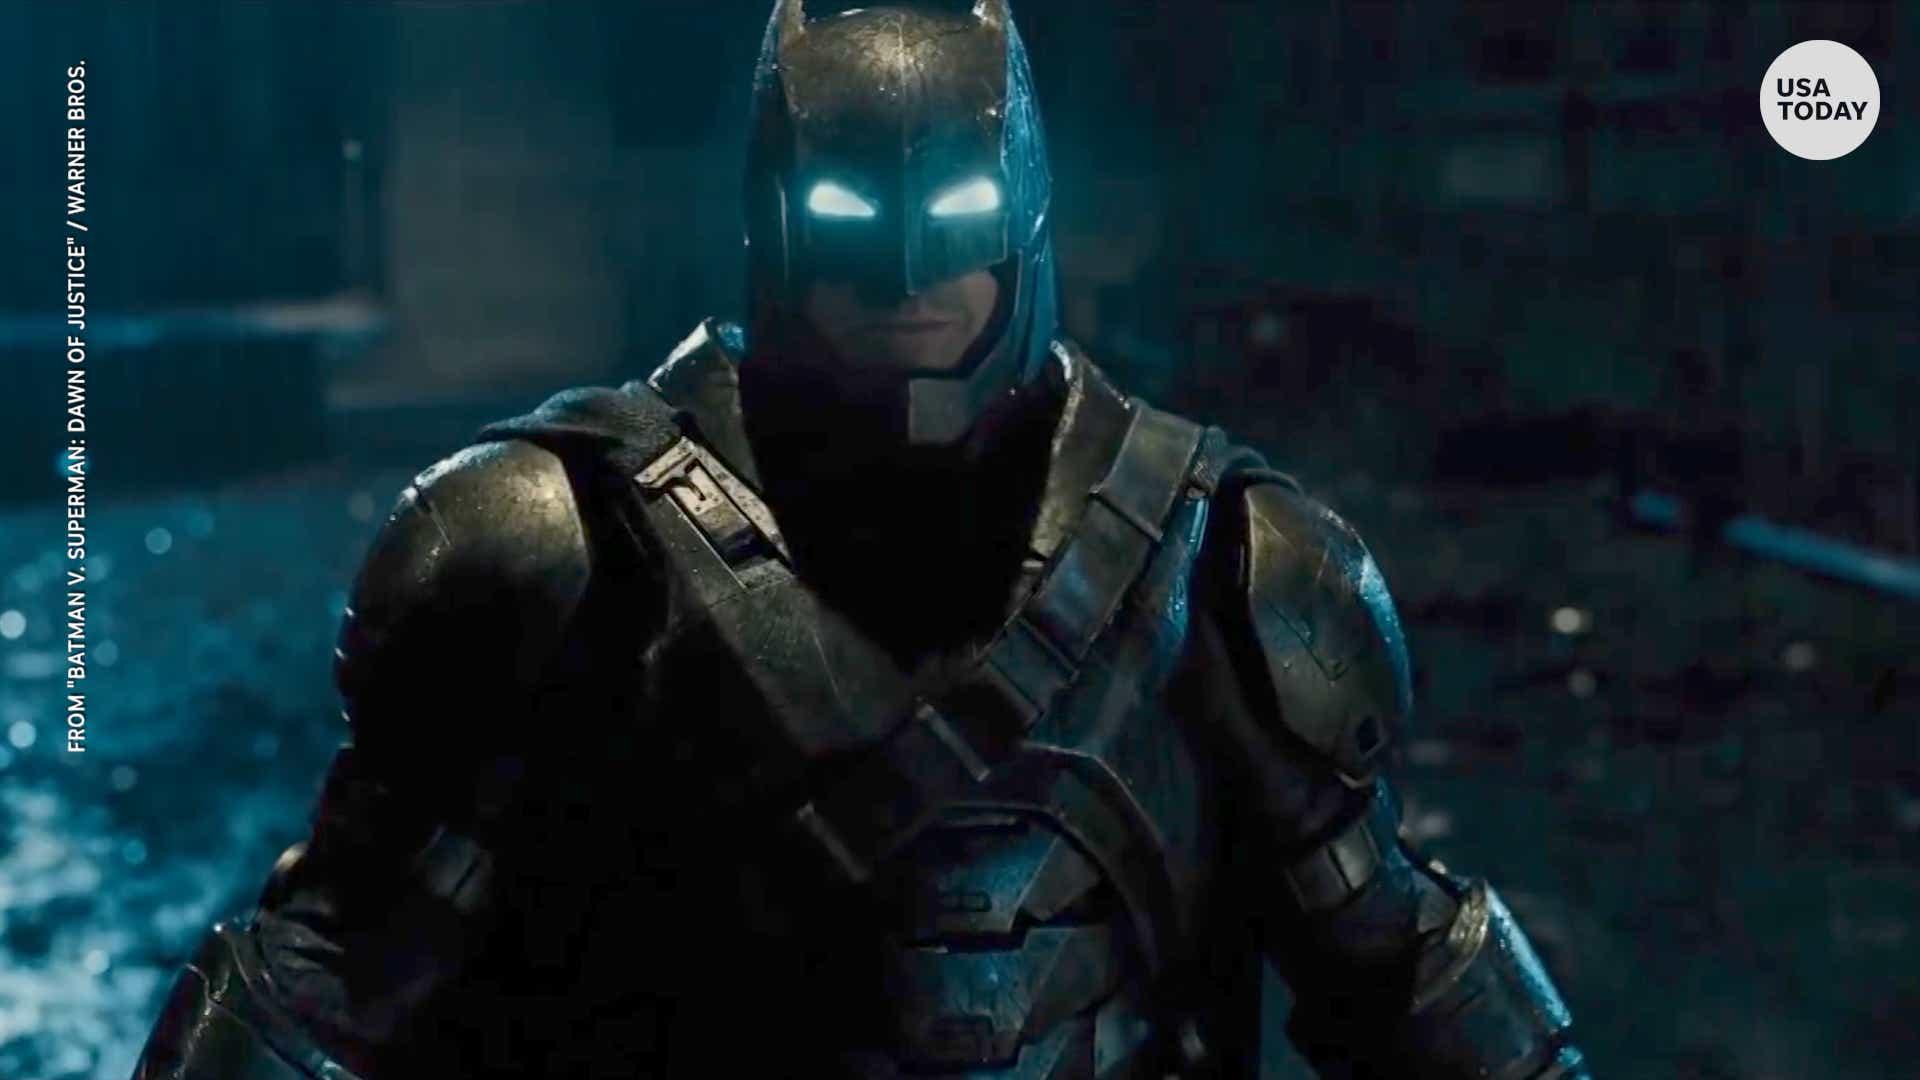 Ben Affleck bows out of next 'Batman'